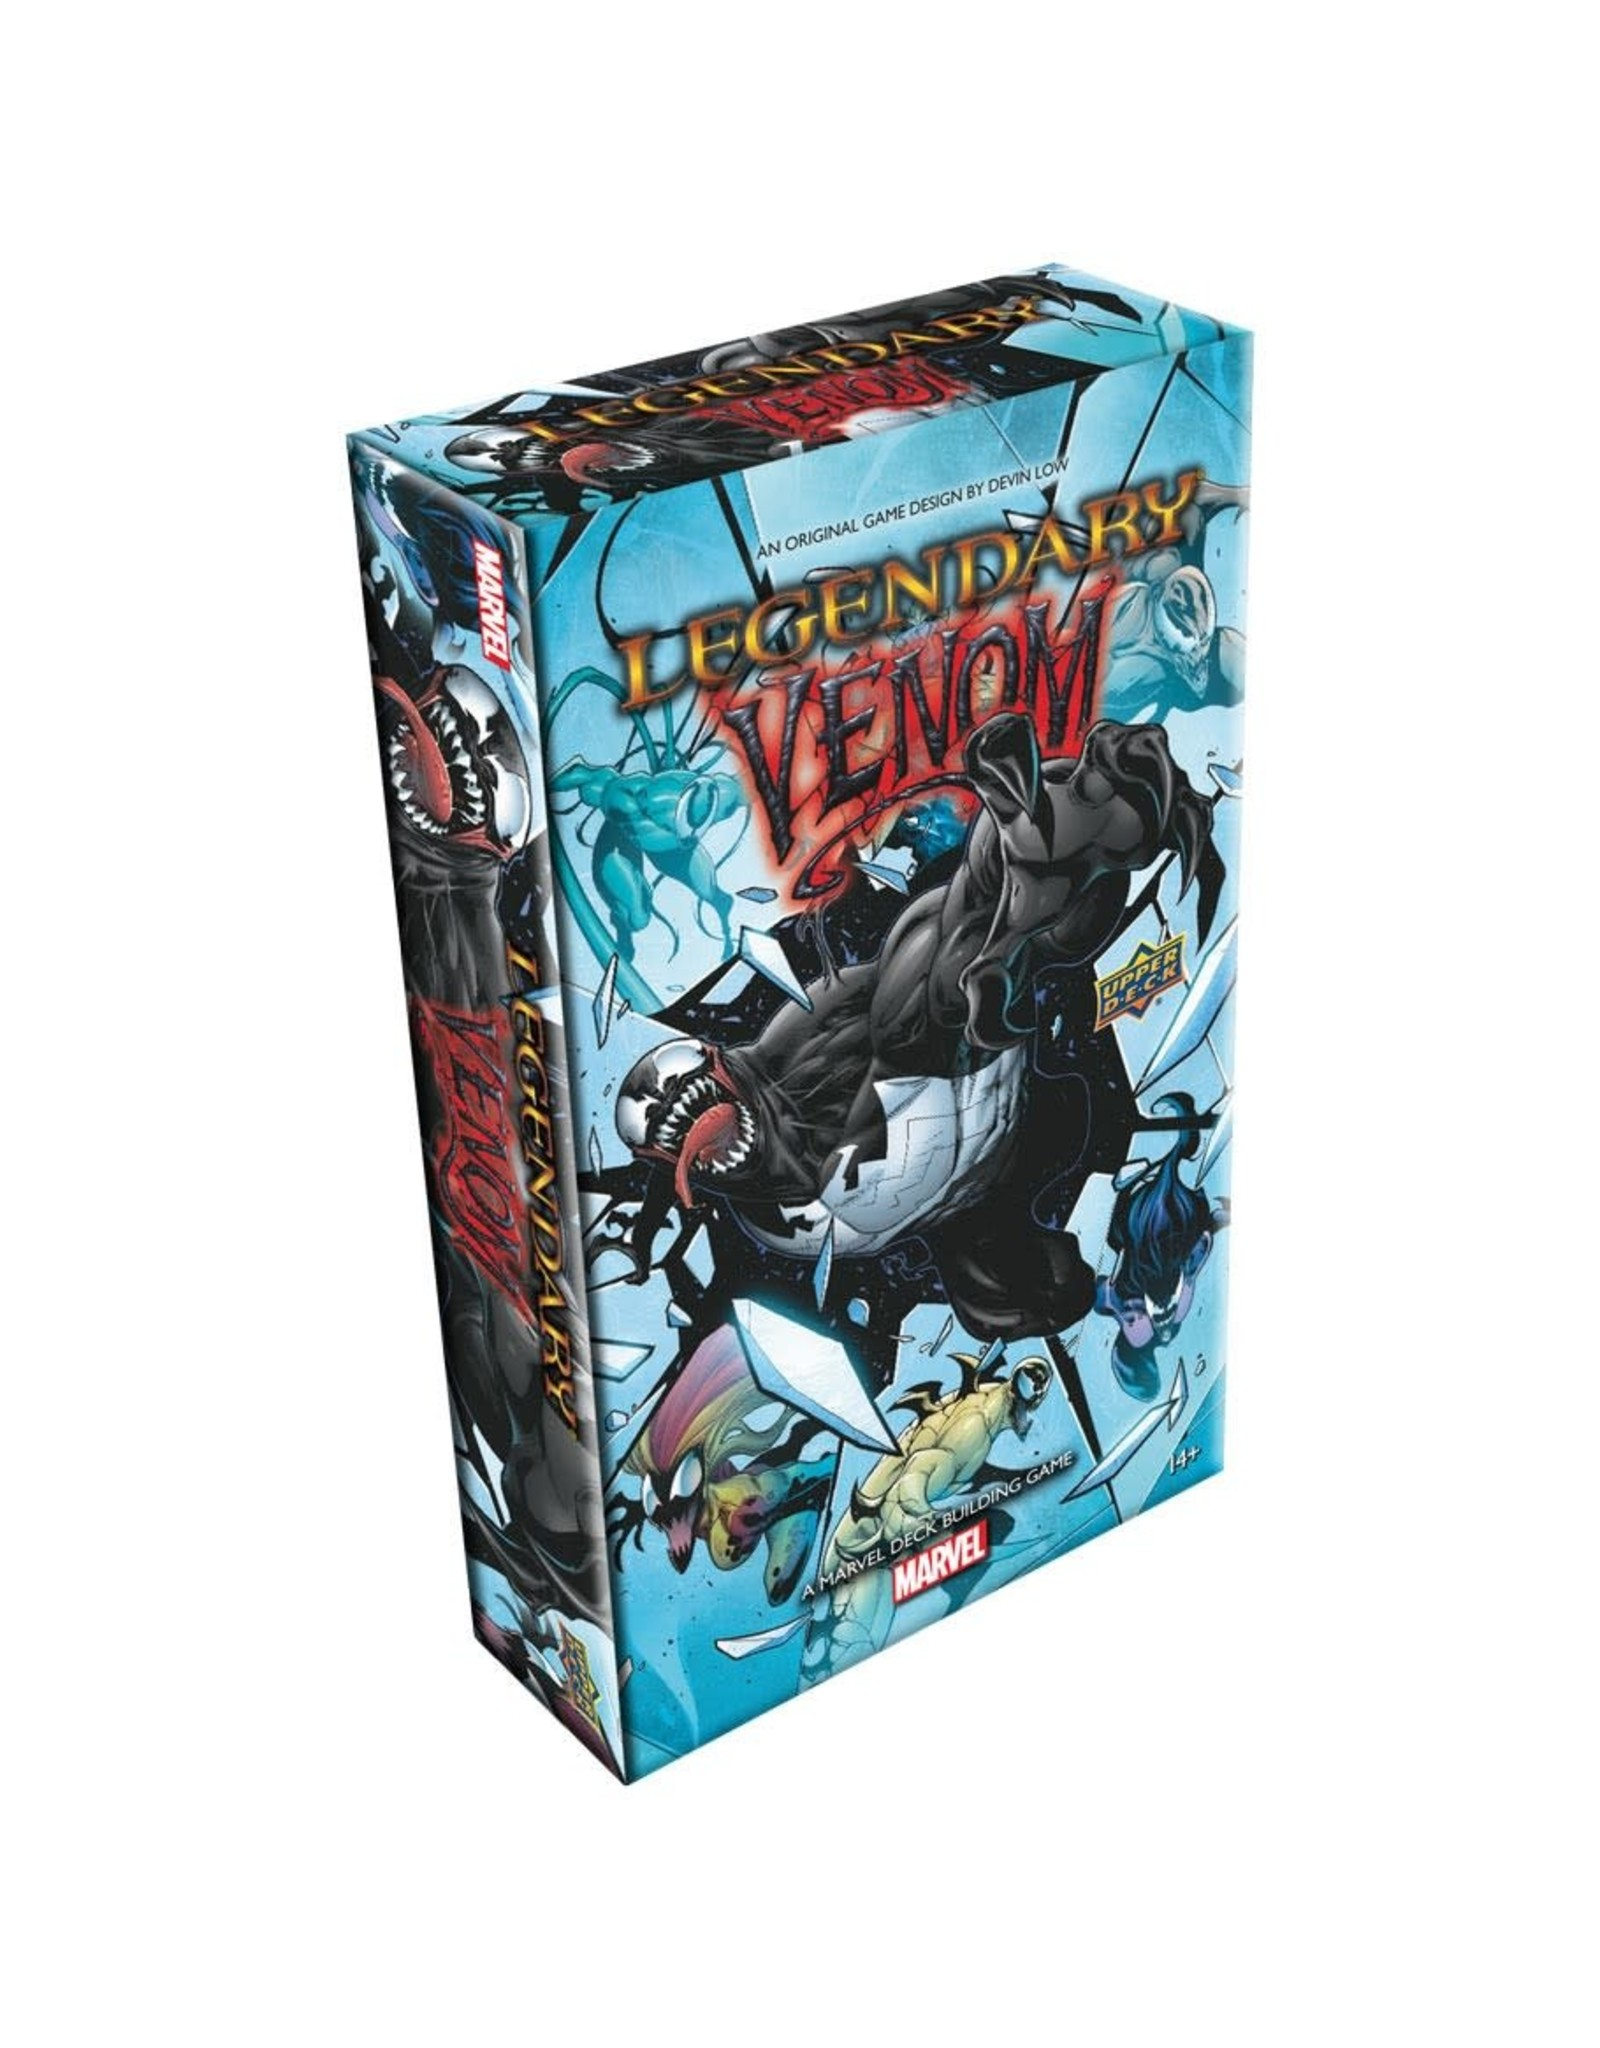 Upper Deck Legendary: Venom